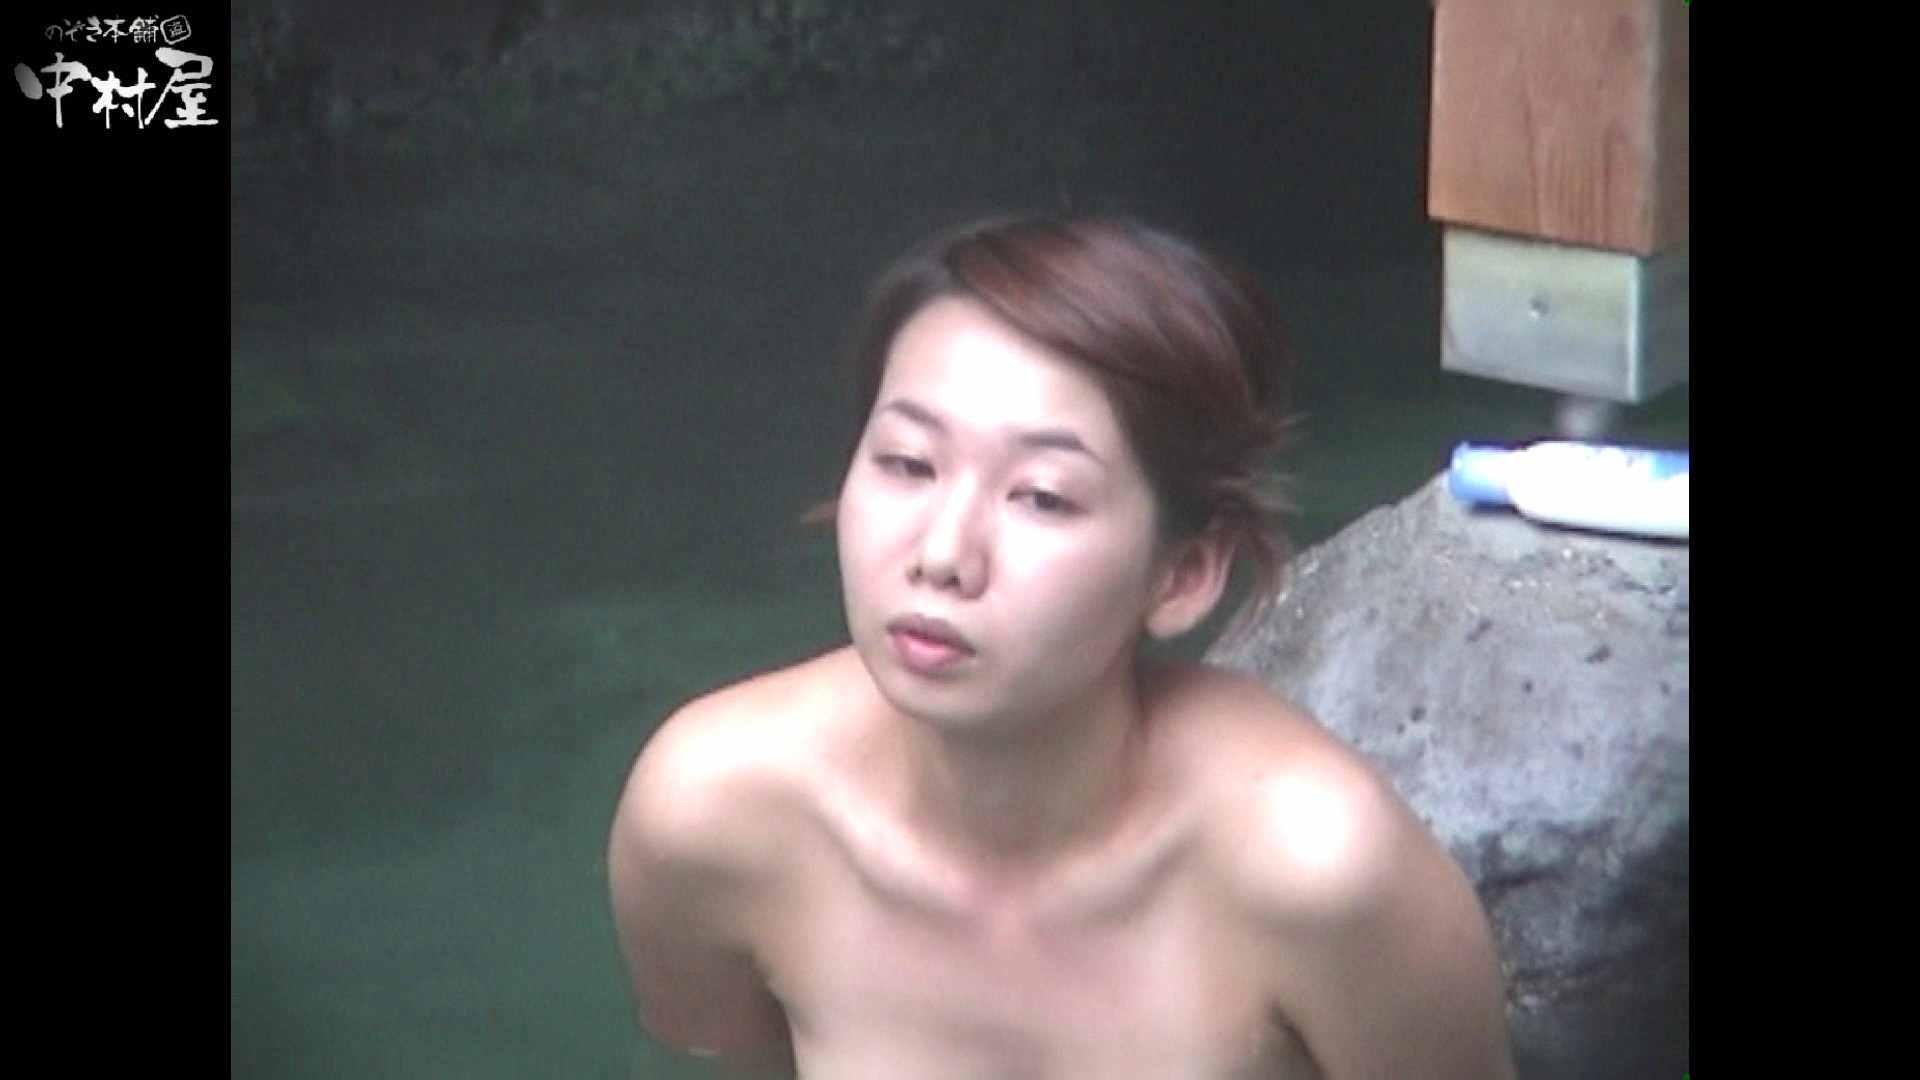 Aquaな露天風呂Vol.951 盗撮映像  93Pix 53